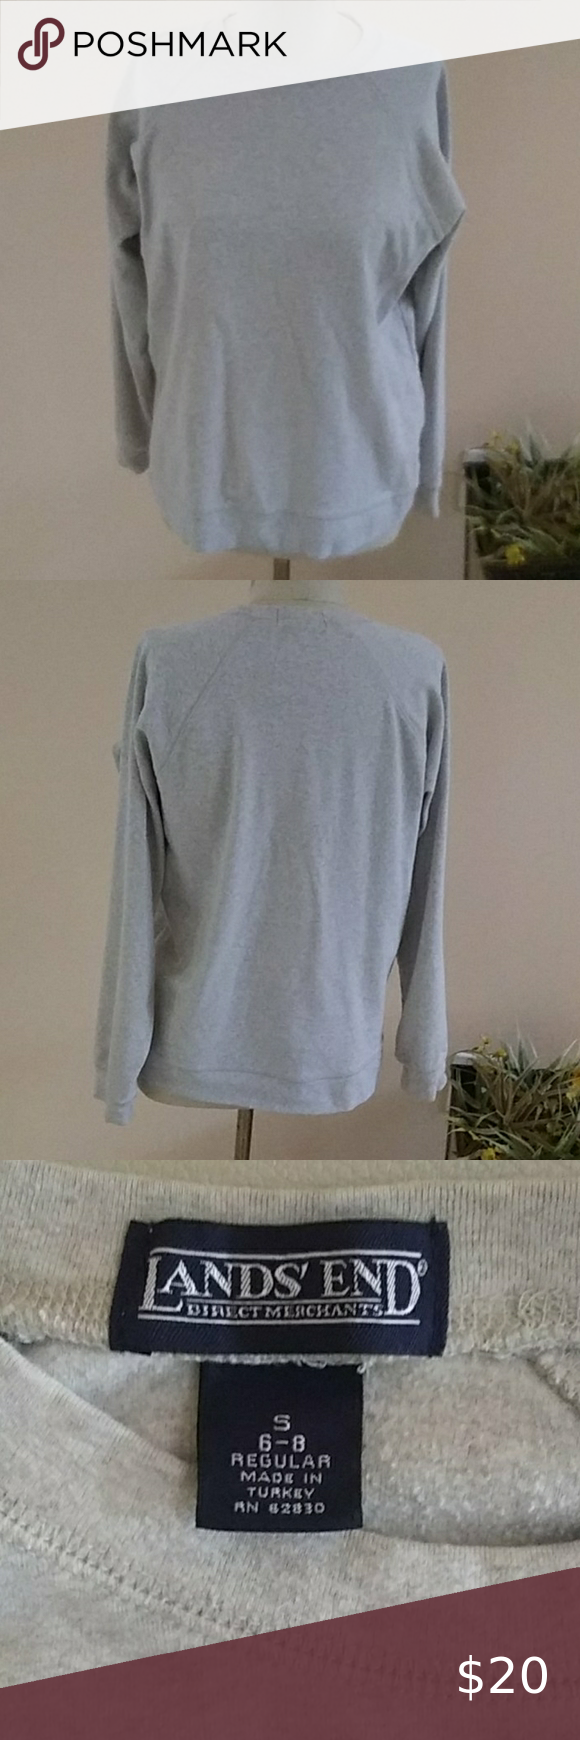 Lands End Top Tops Long Sleeve Tops Long Sleeve Tshirt Men [ 1740 x 580 Pixel ]